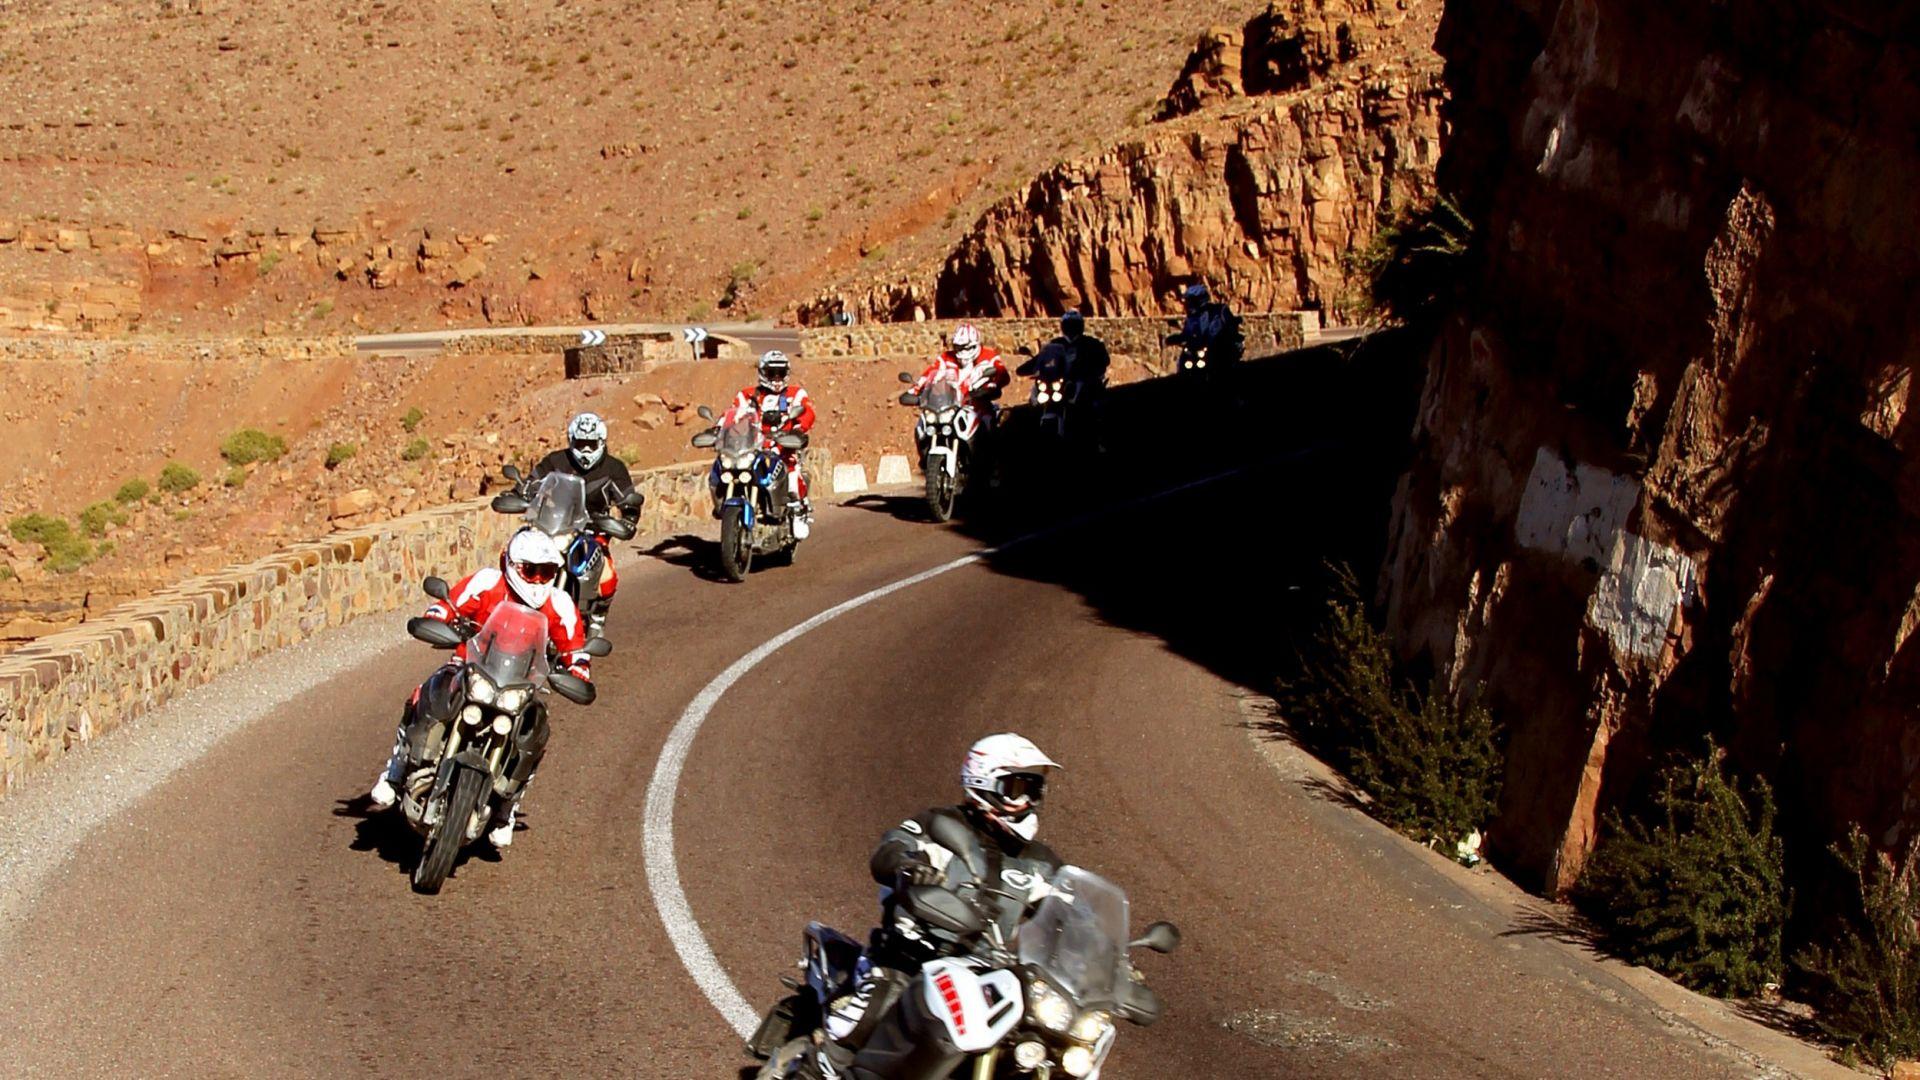 Immagine 88: In Marocco con la Yamaha Super Ténéré